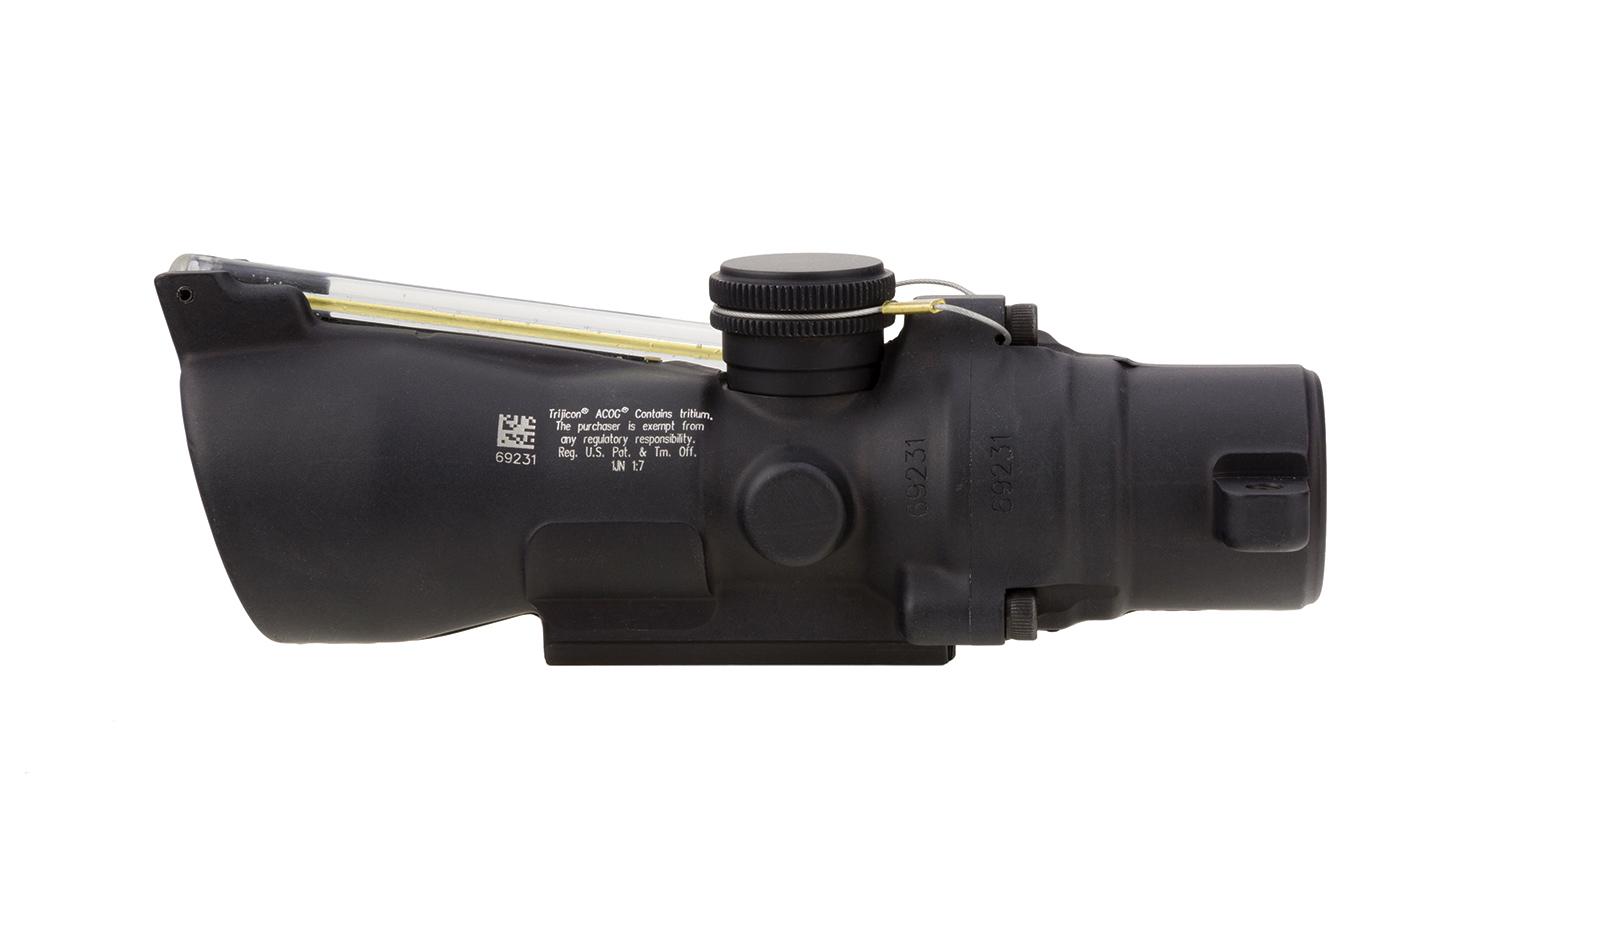 TA50-C-400230 angle 2